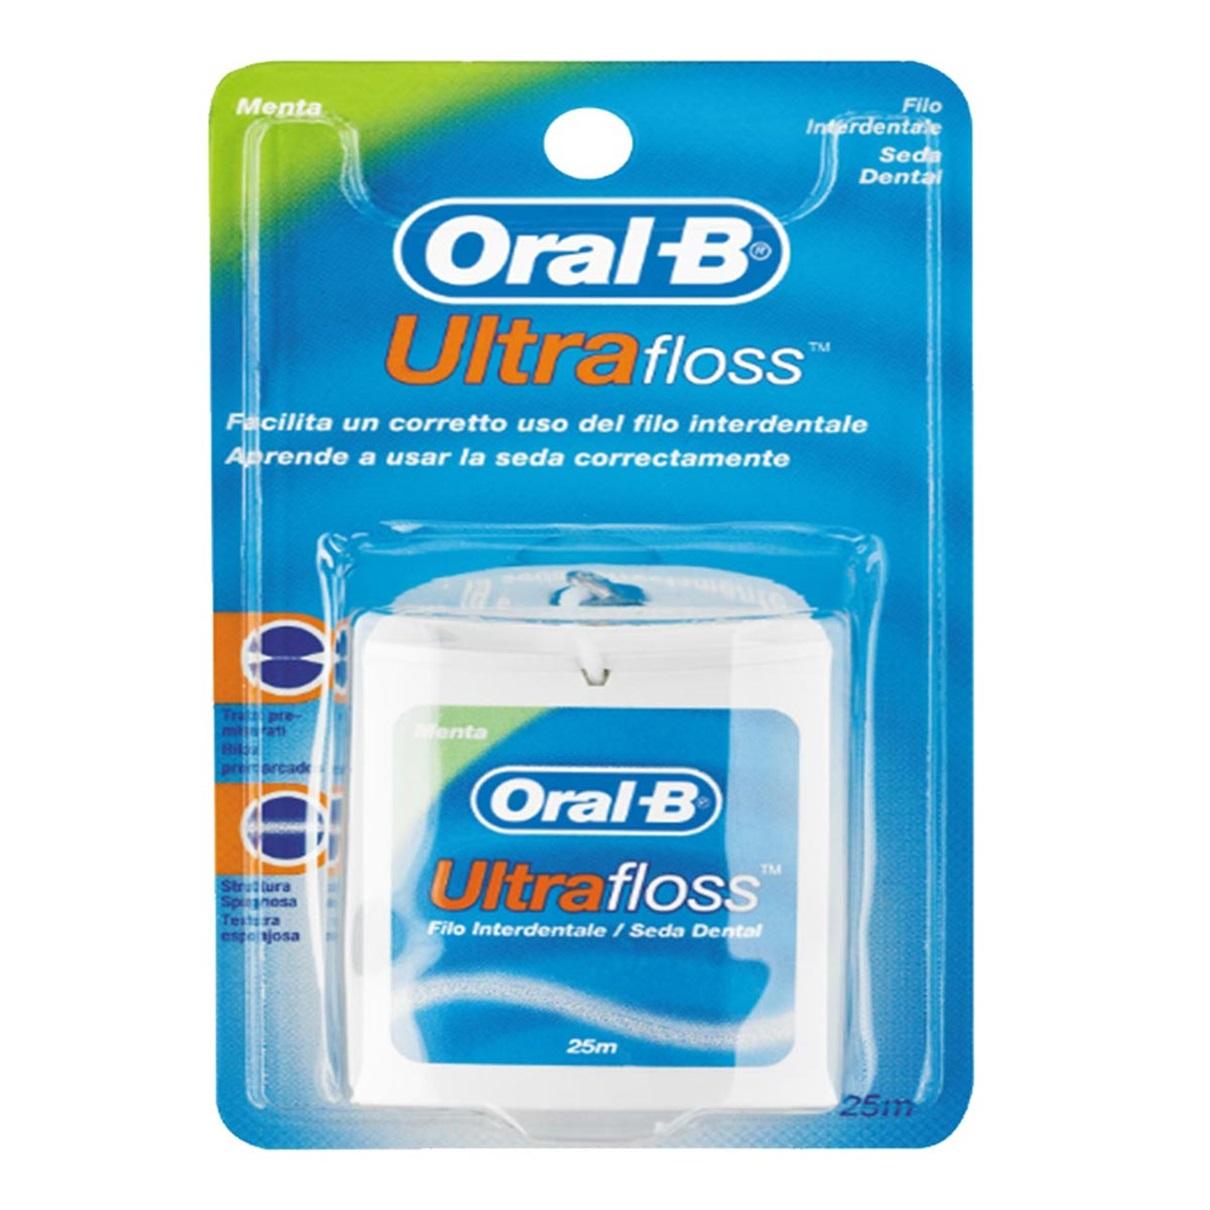 5099457001154_81515659_filo-interdentale-oral-b-ultra-floss_1200